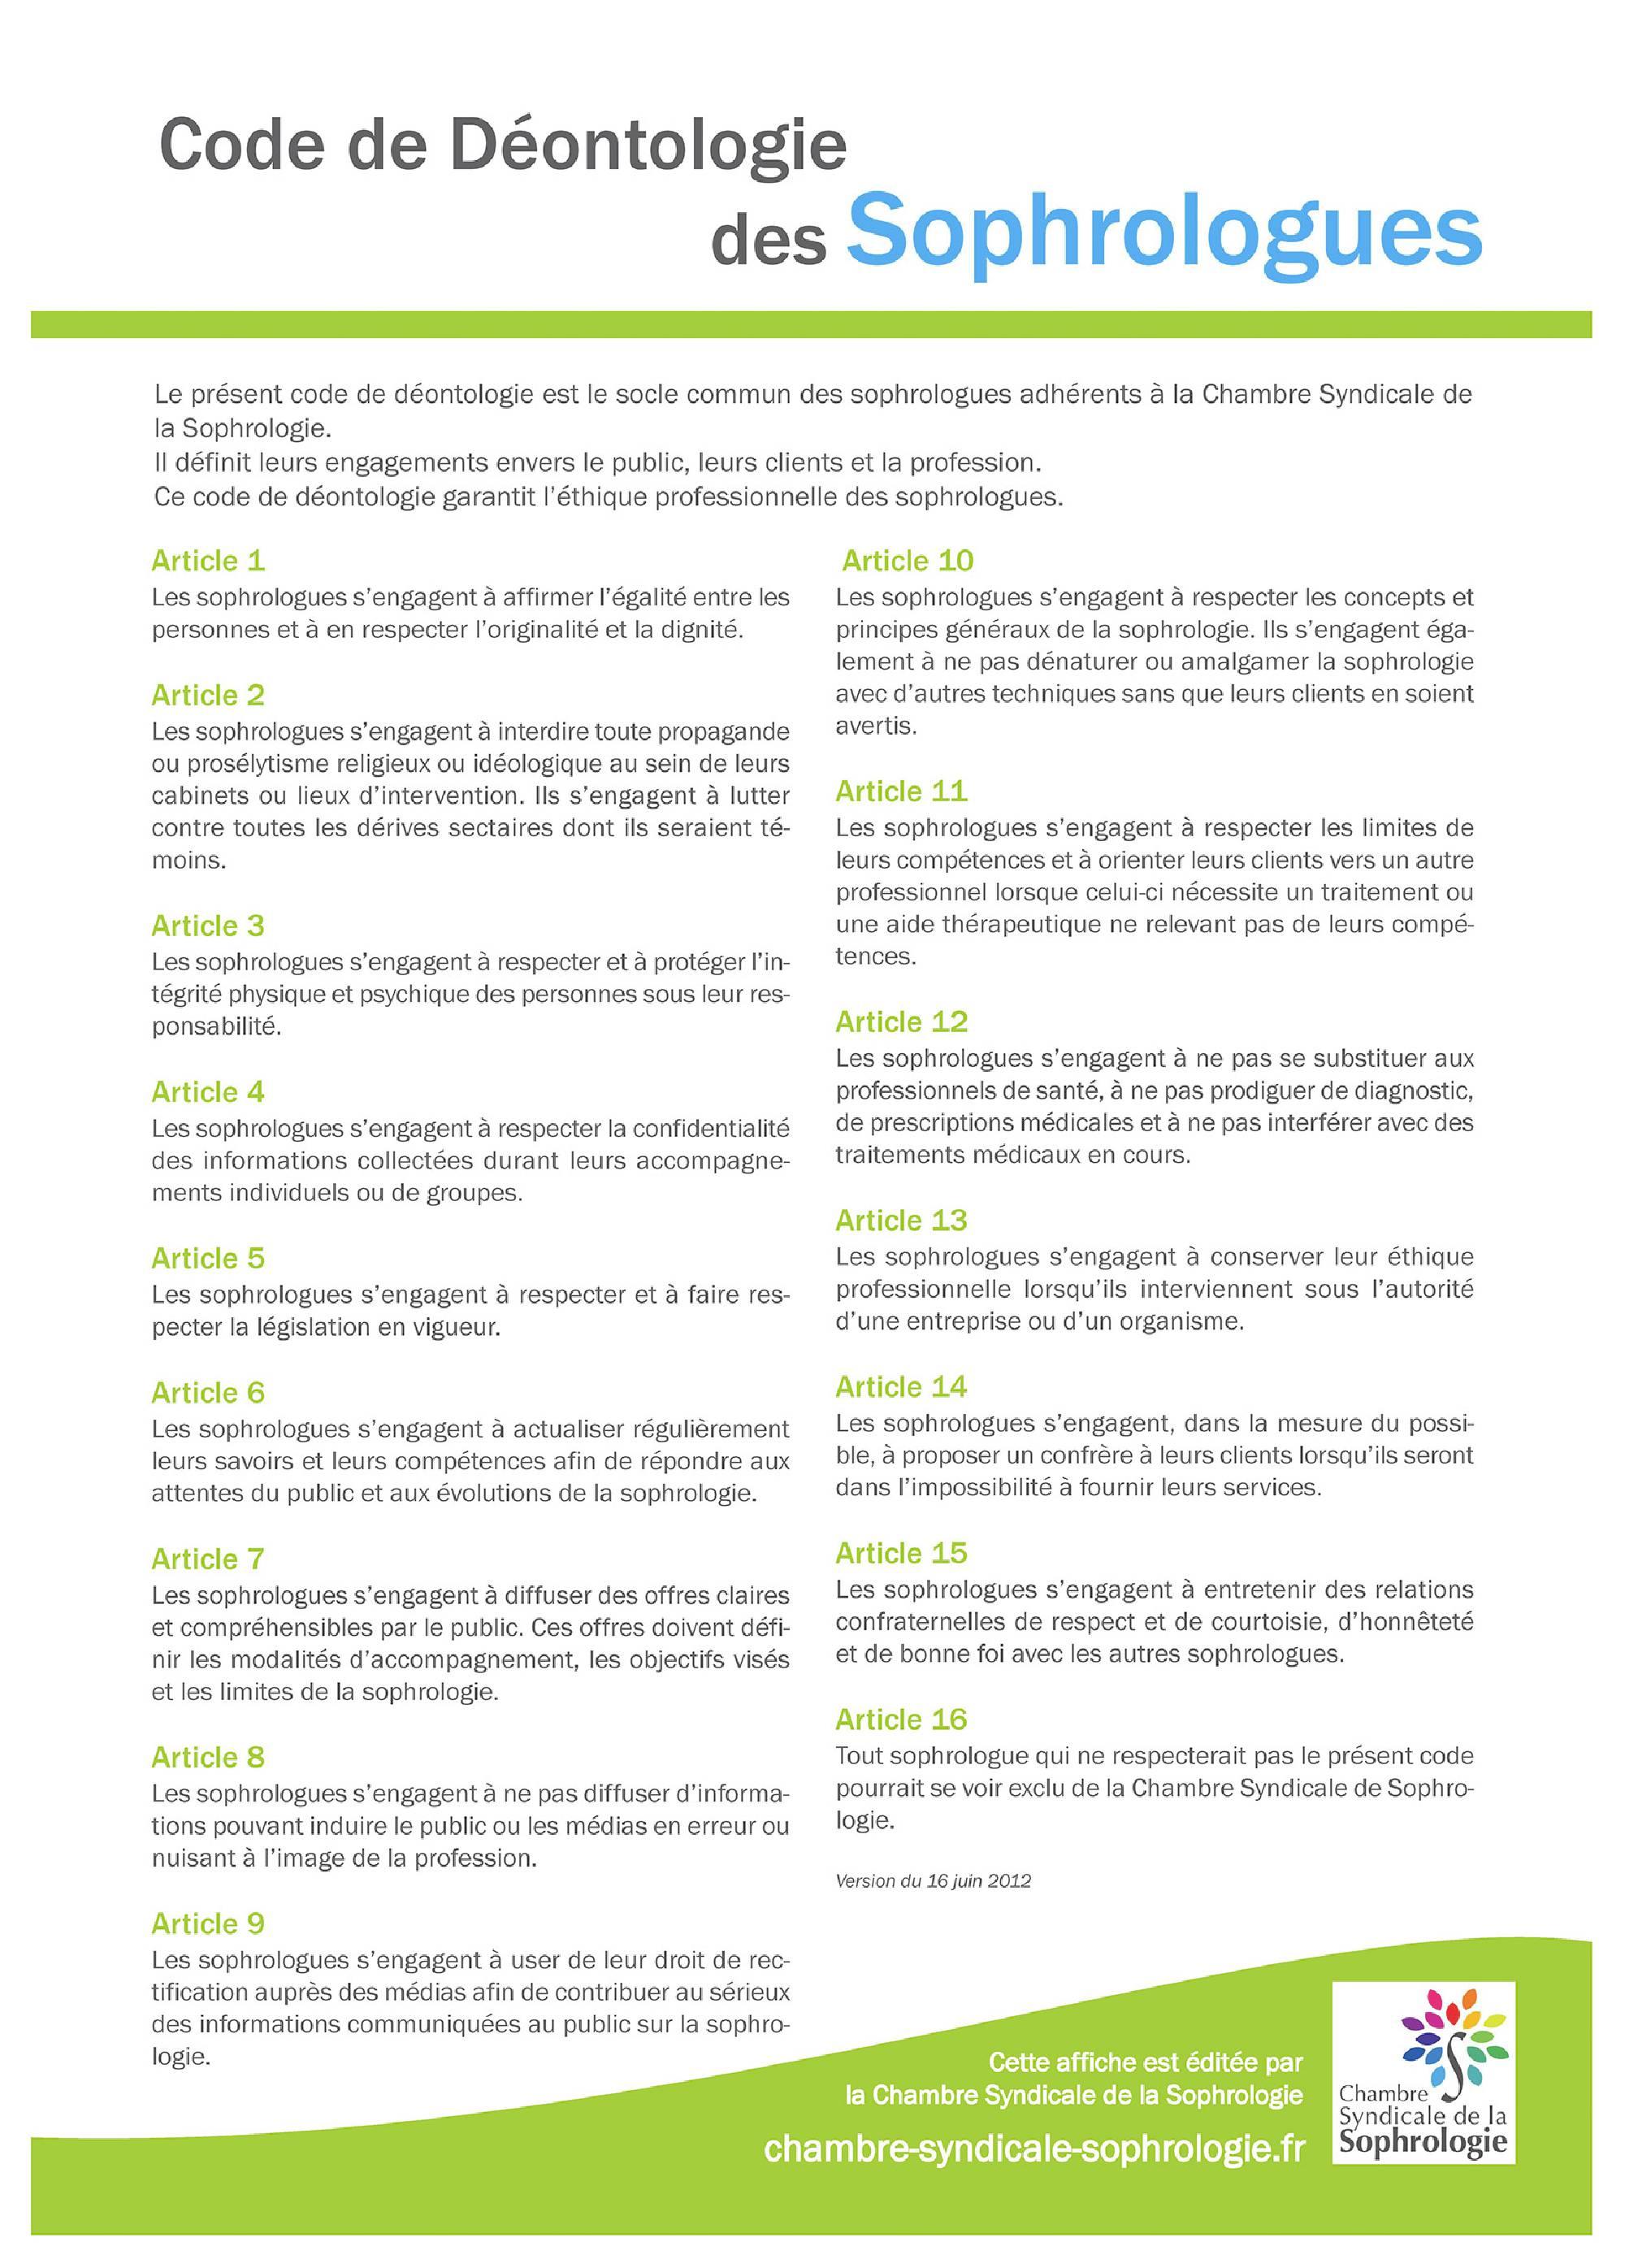 Code de déontologie Sophrologie